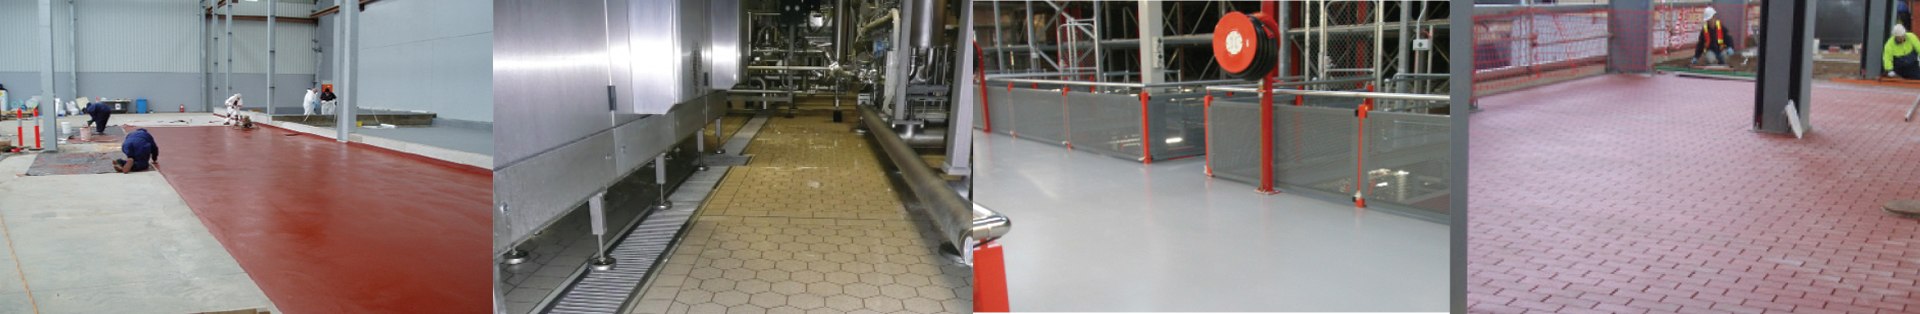 METZ Acid Protection Systems range